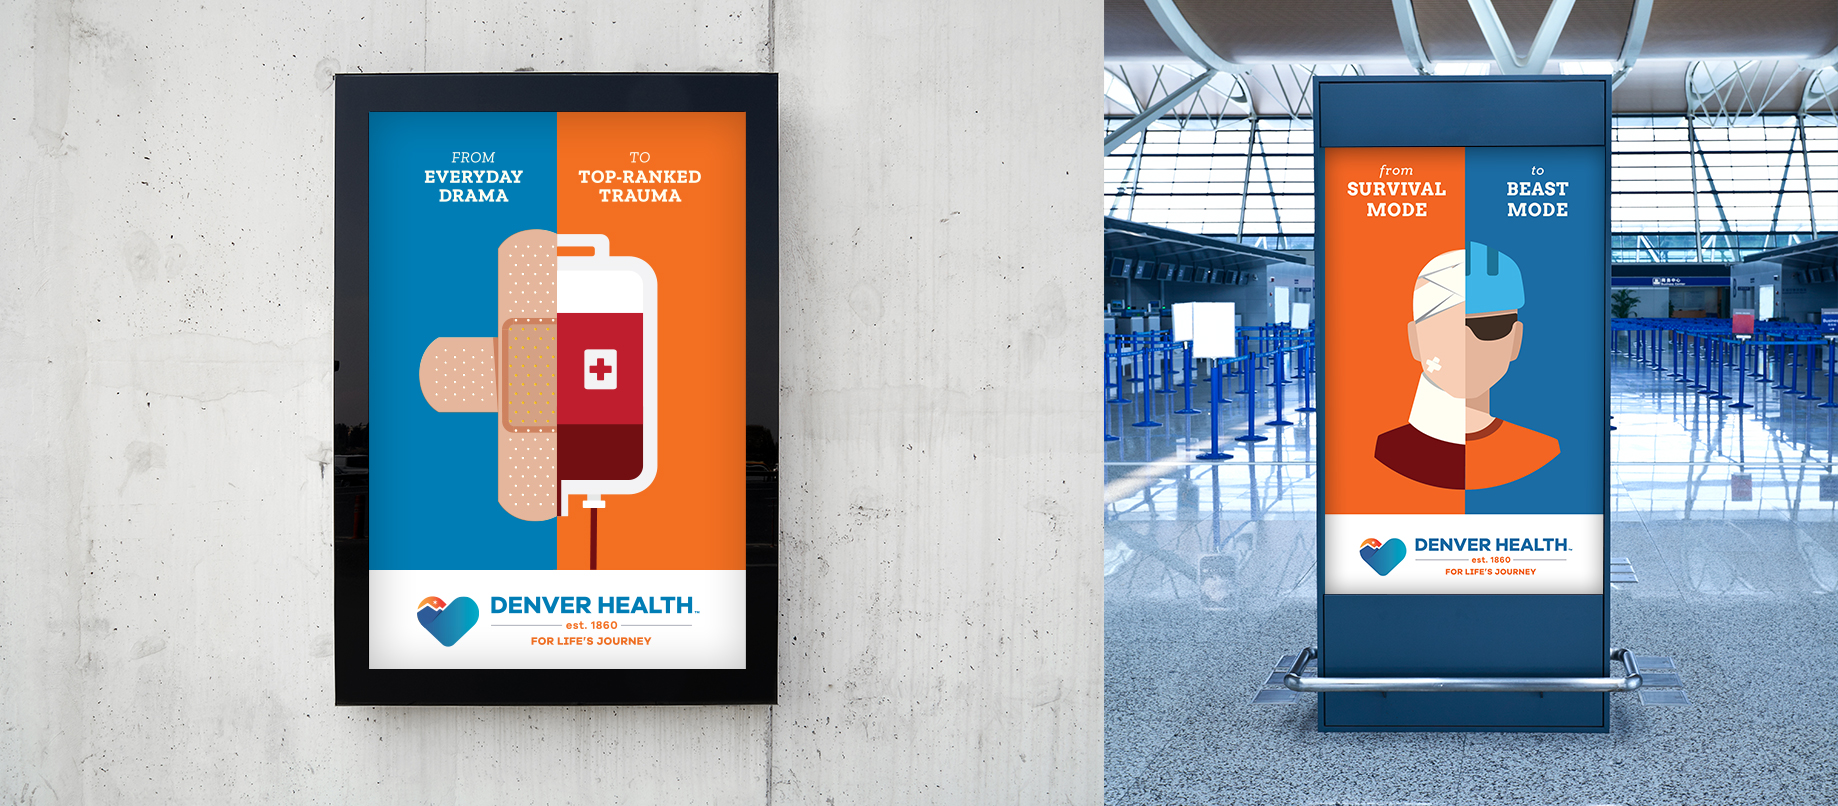 Denver Health   smbk co